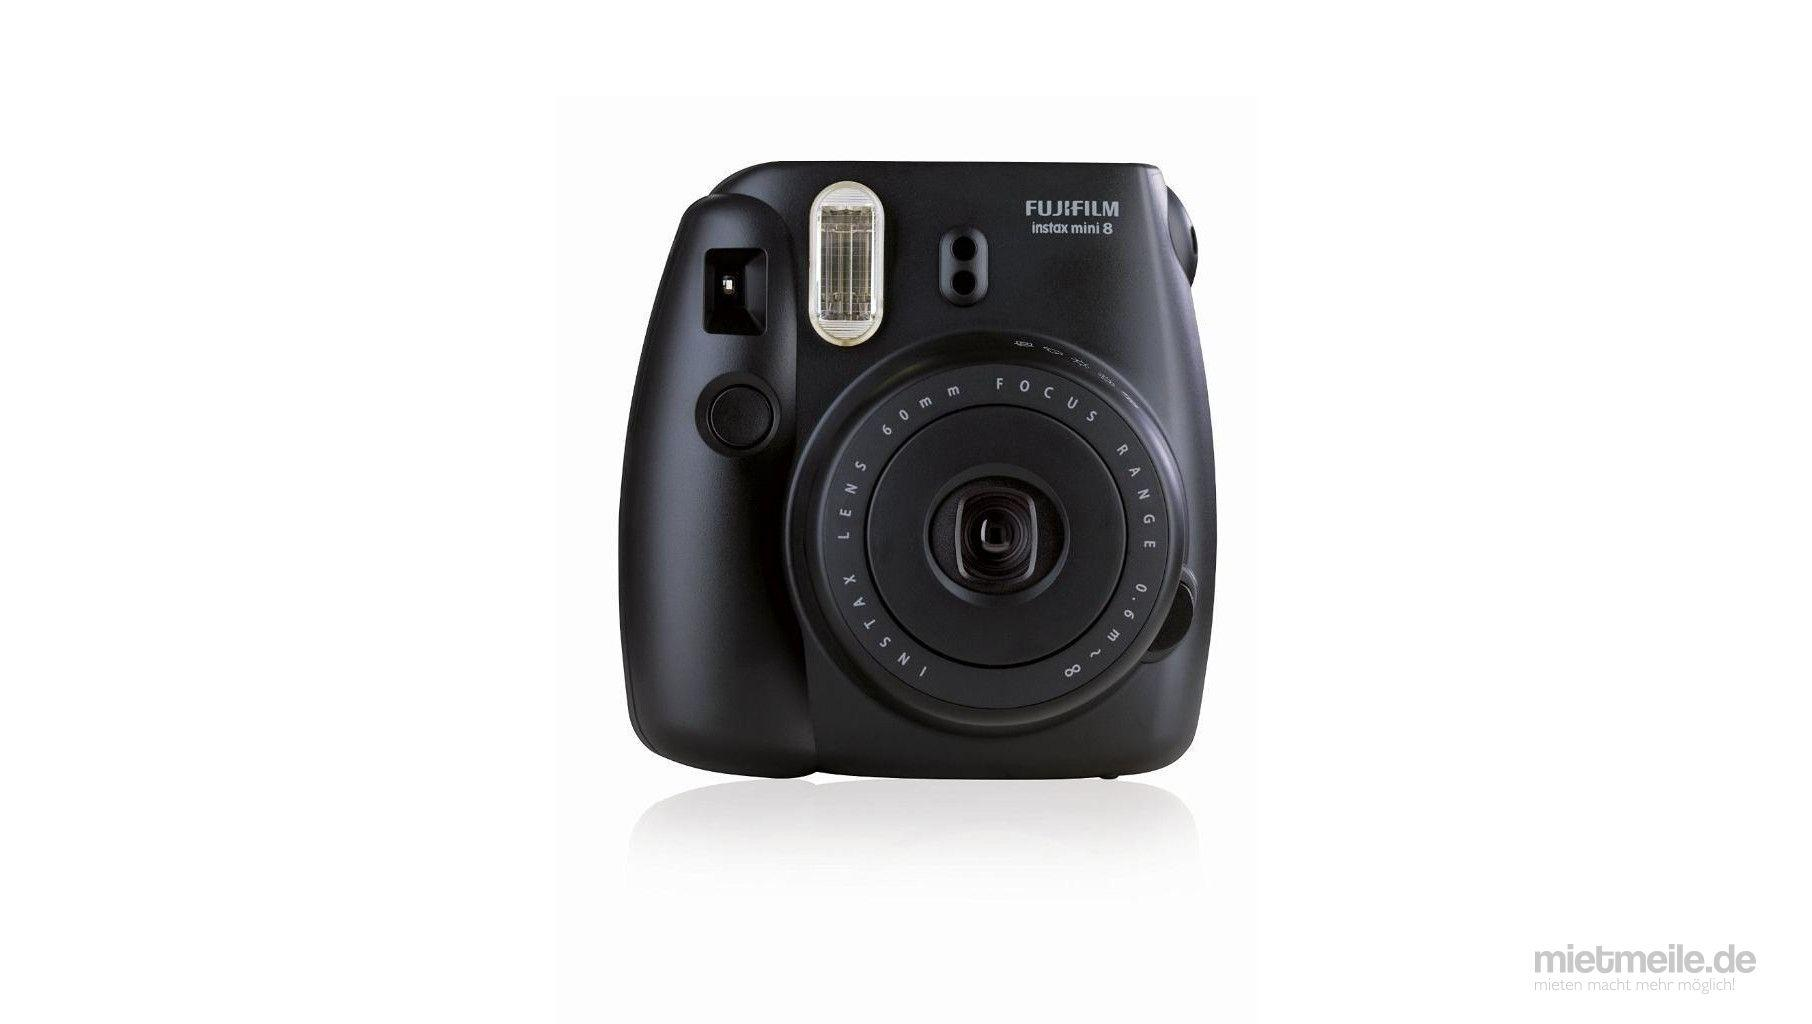 Fotobox mieten & vermieten - Sofortbildkamera Polaroid Kamera Instax in Schkeuditz